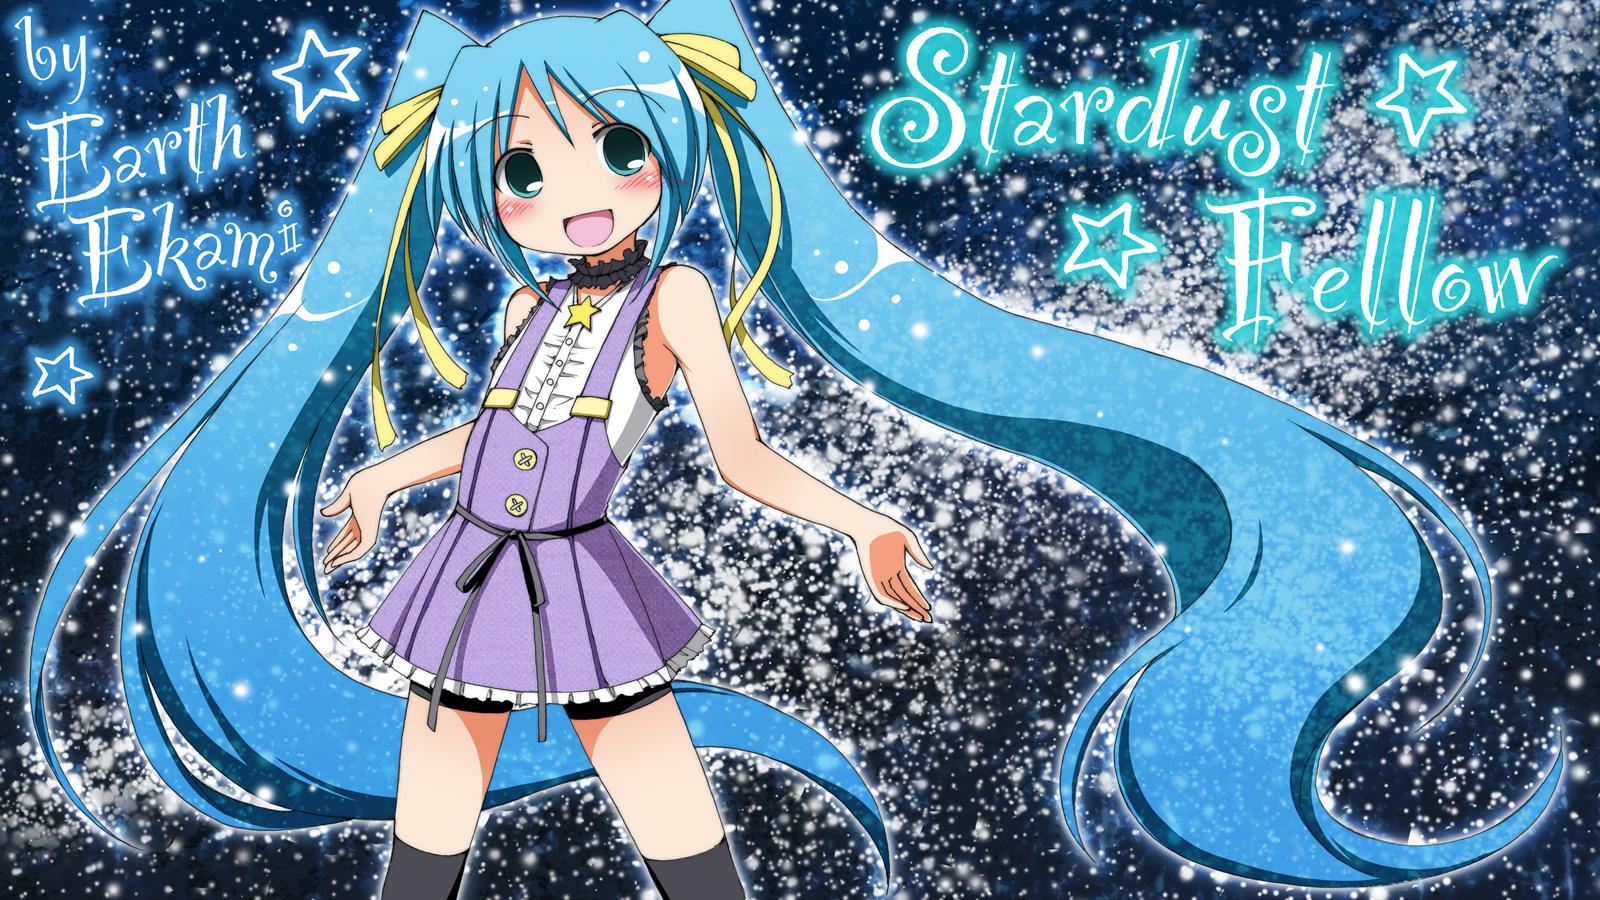 http://blueandgreen.jp/images/stardust_fellow.jpg